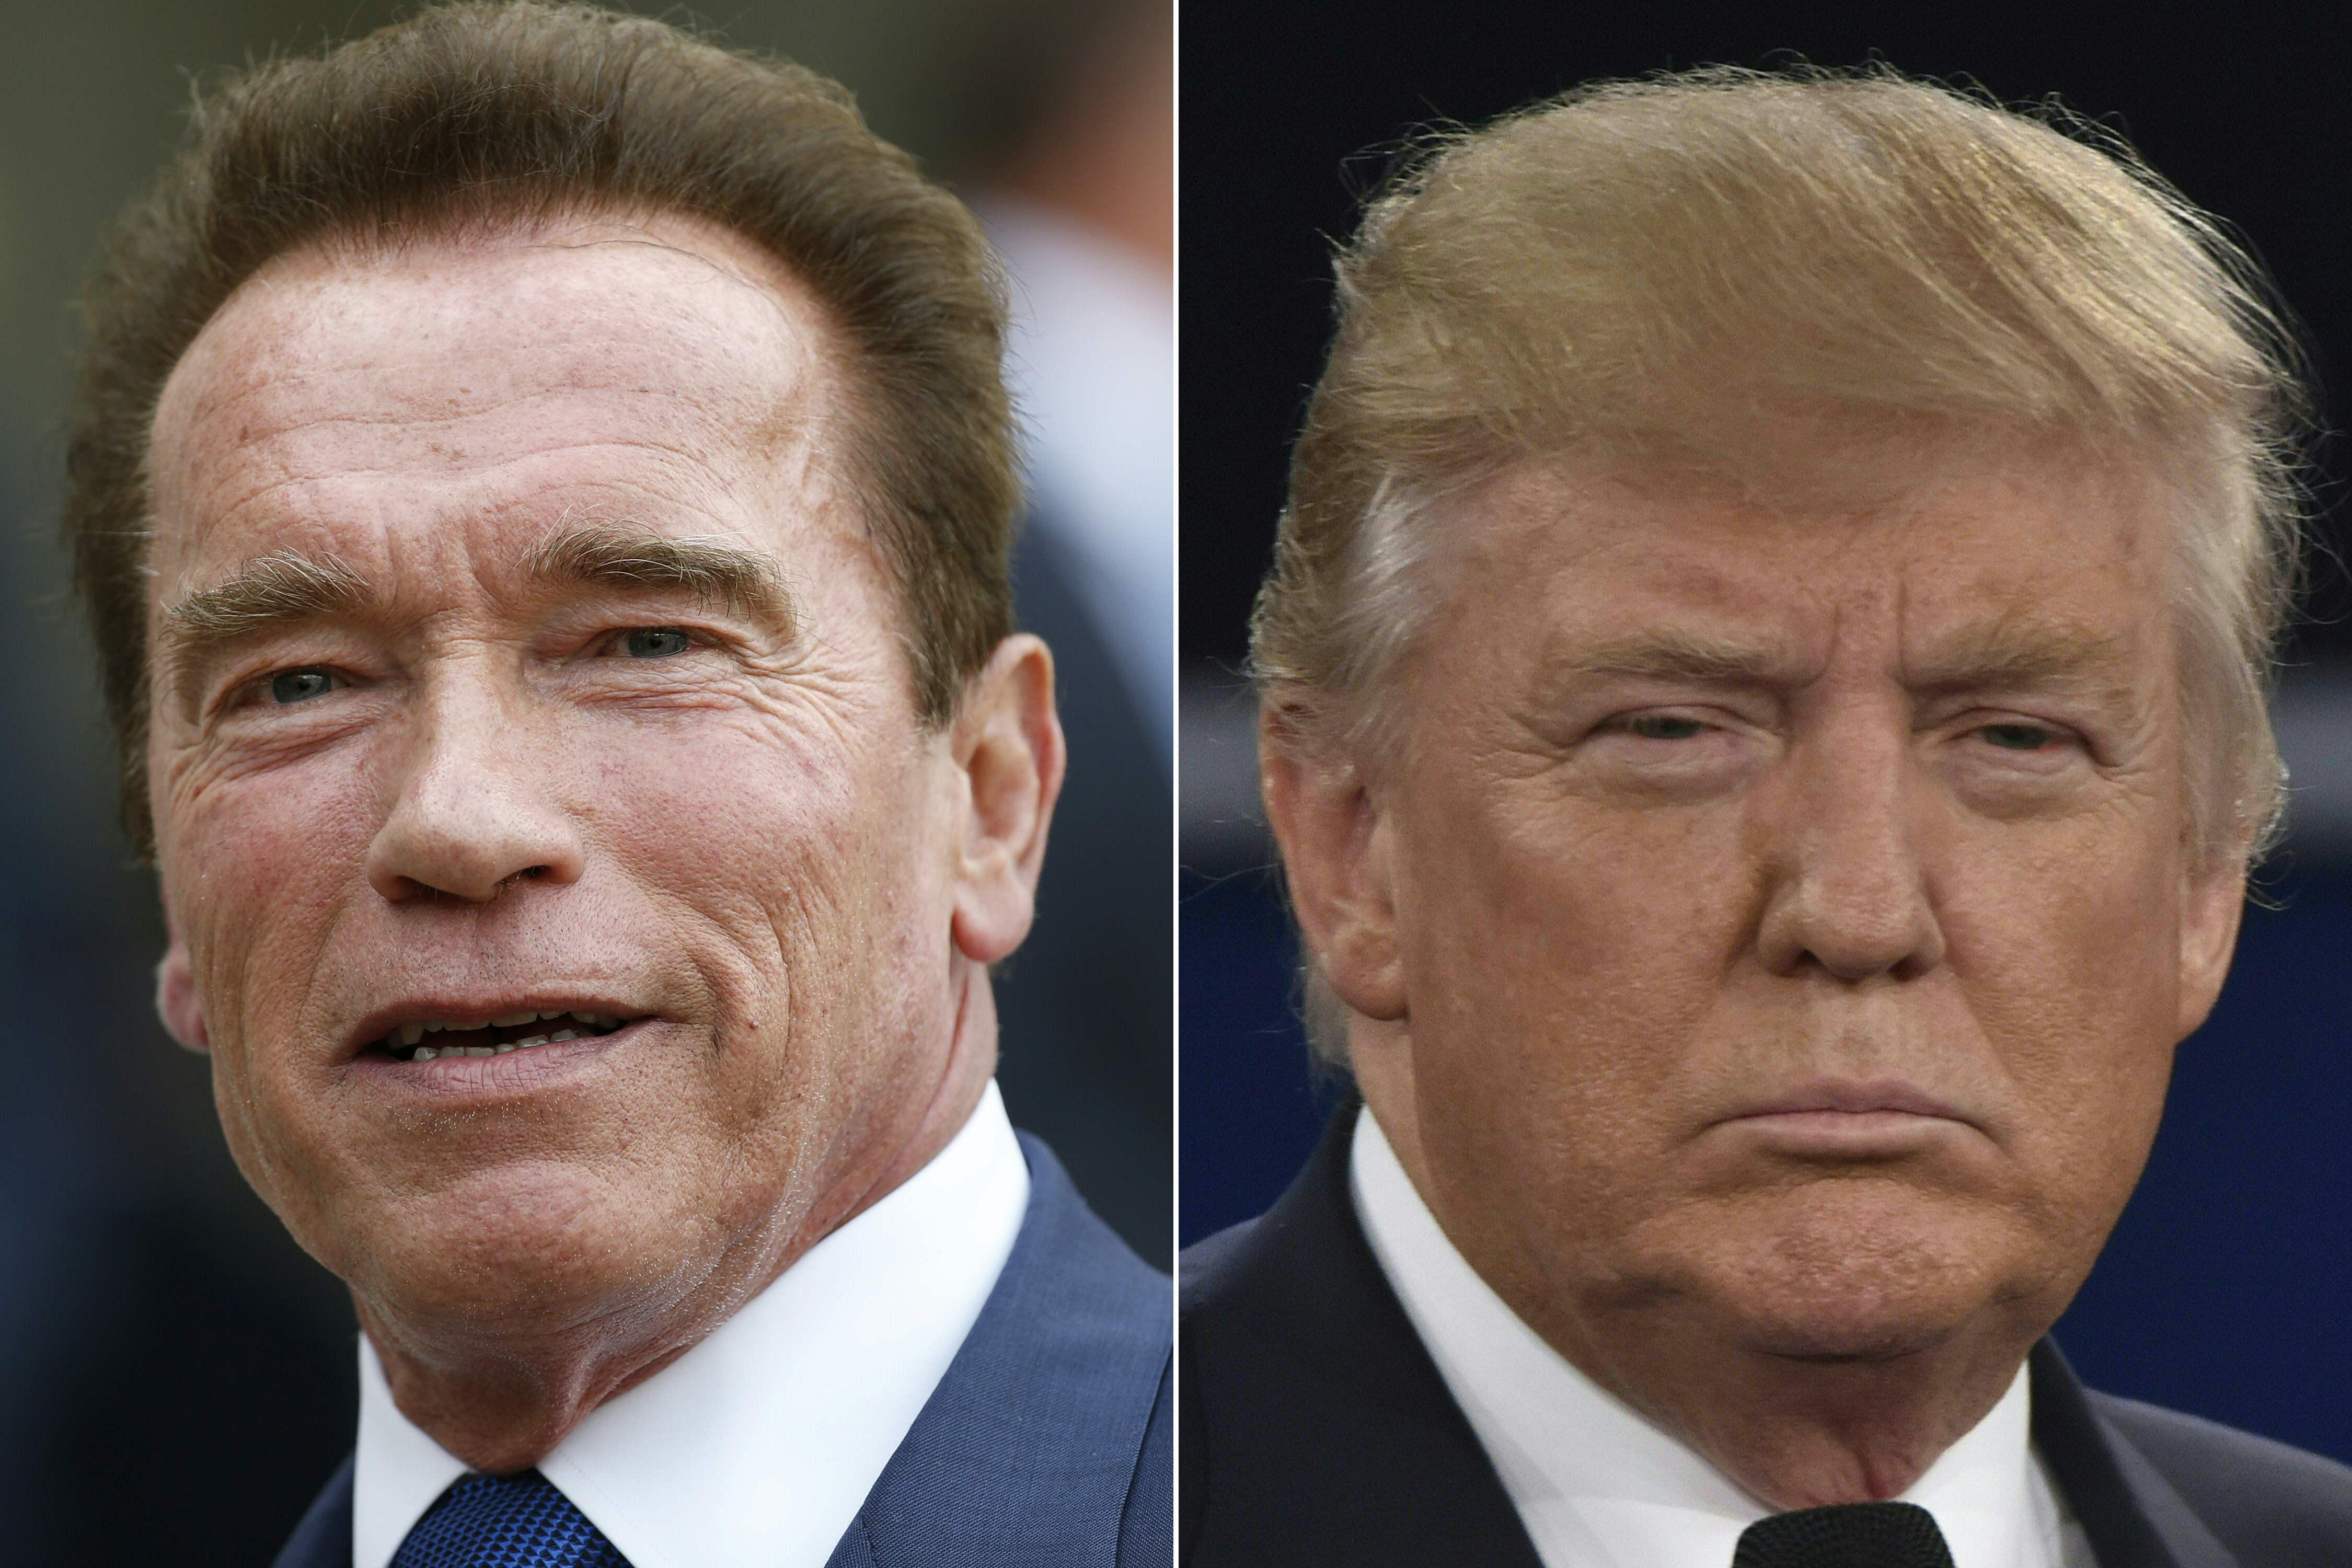 Arnold Schwarzenegger rises above Donald Trump after he mocks The Celebrity Apprentice ratings dip